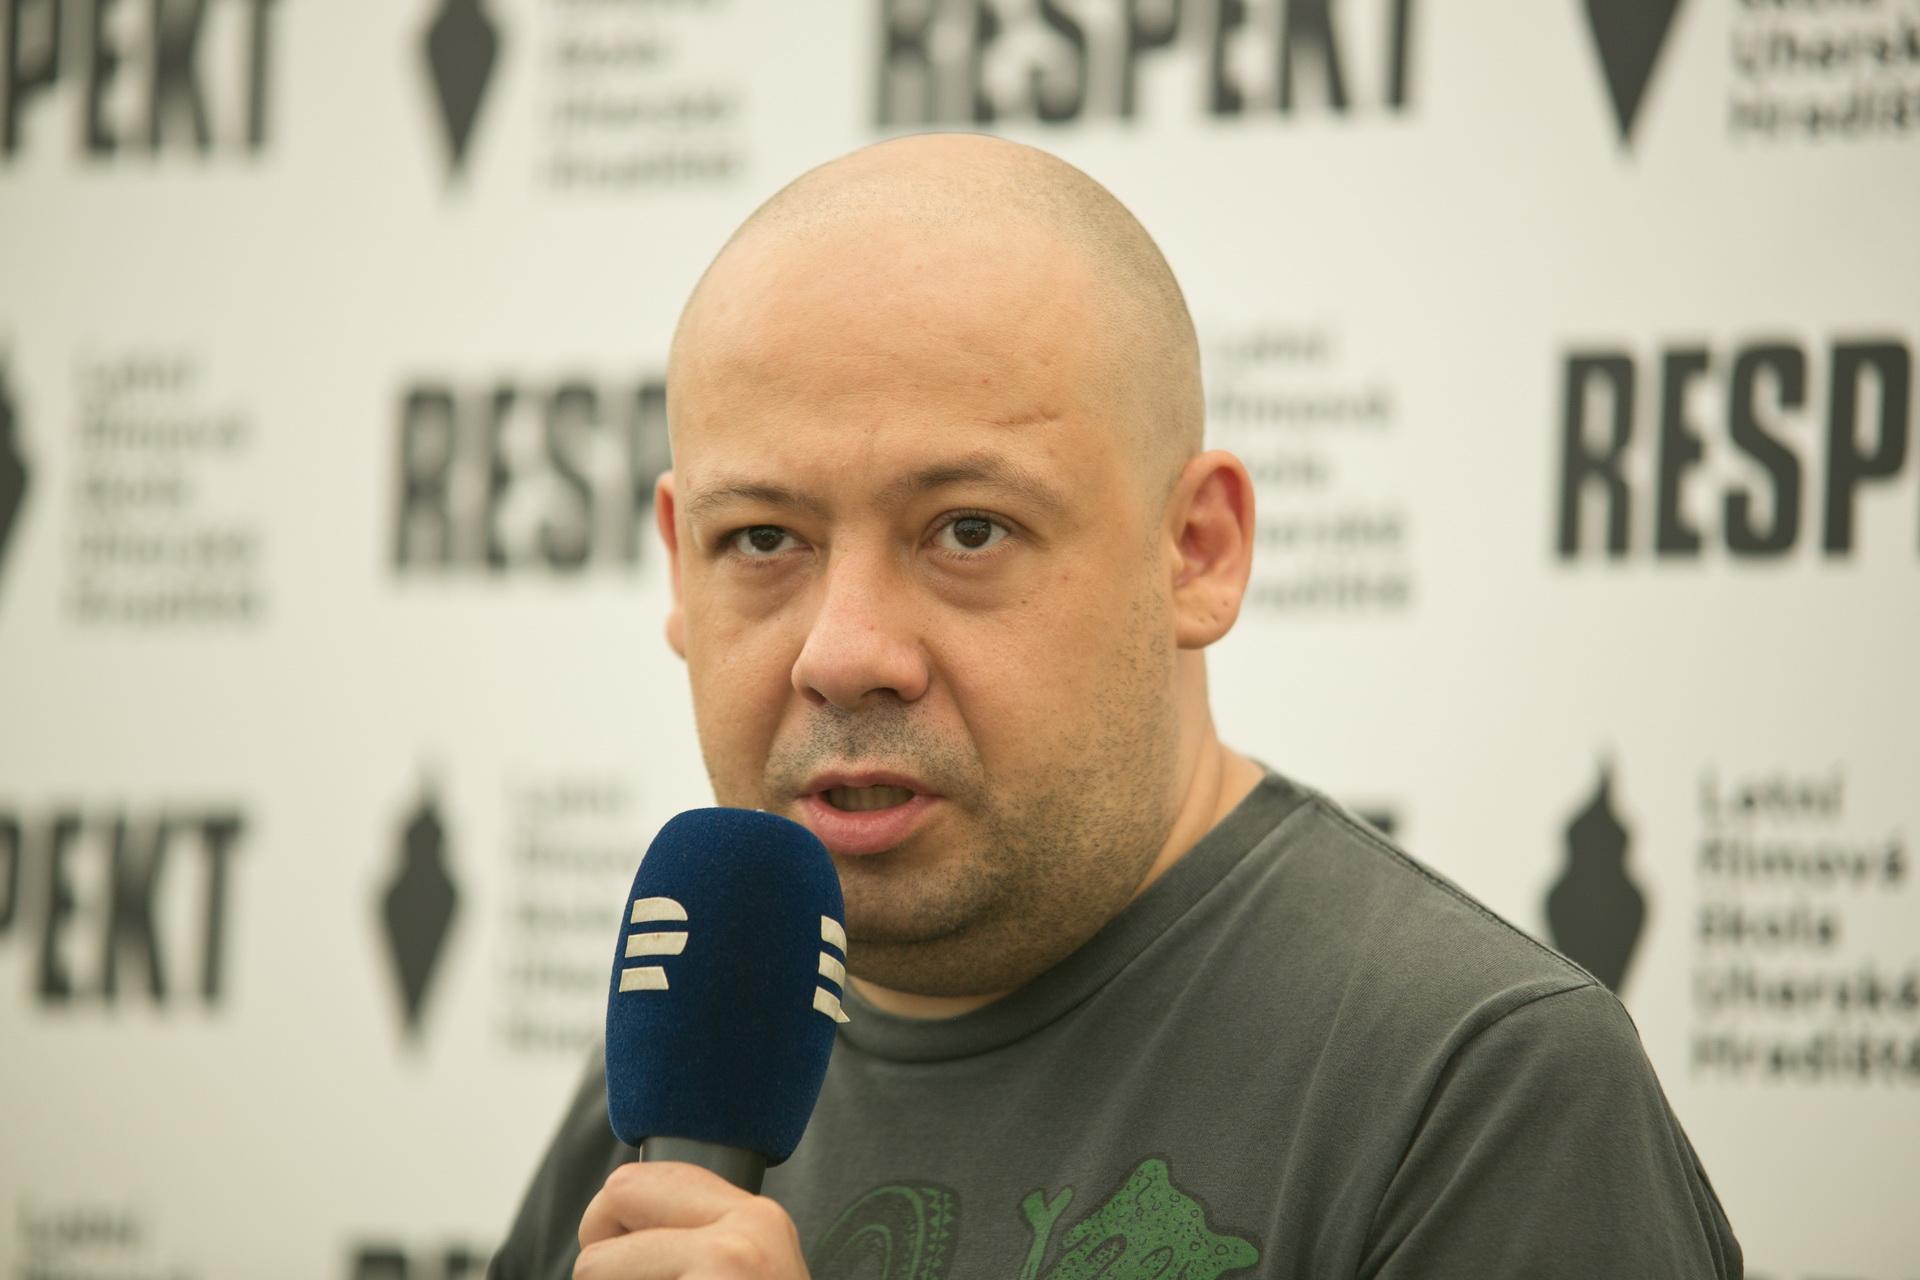 Režisér Alexej German ml., živě vysílaný speciál pořadu Reflexe: Film! z 45. Letní filmové školy